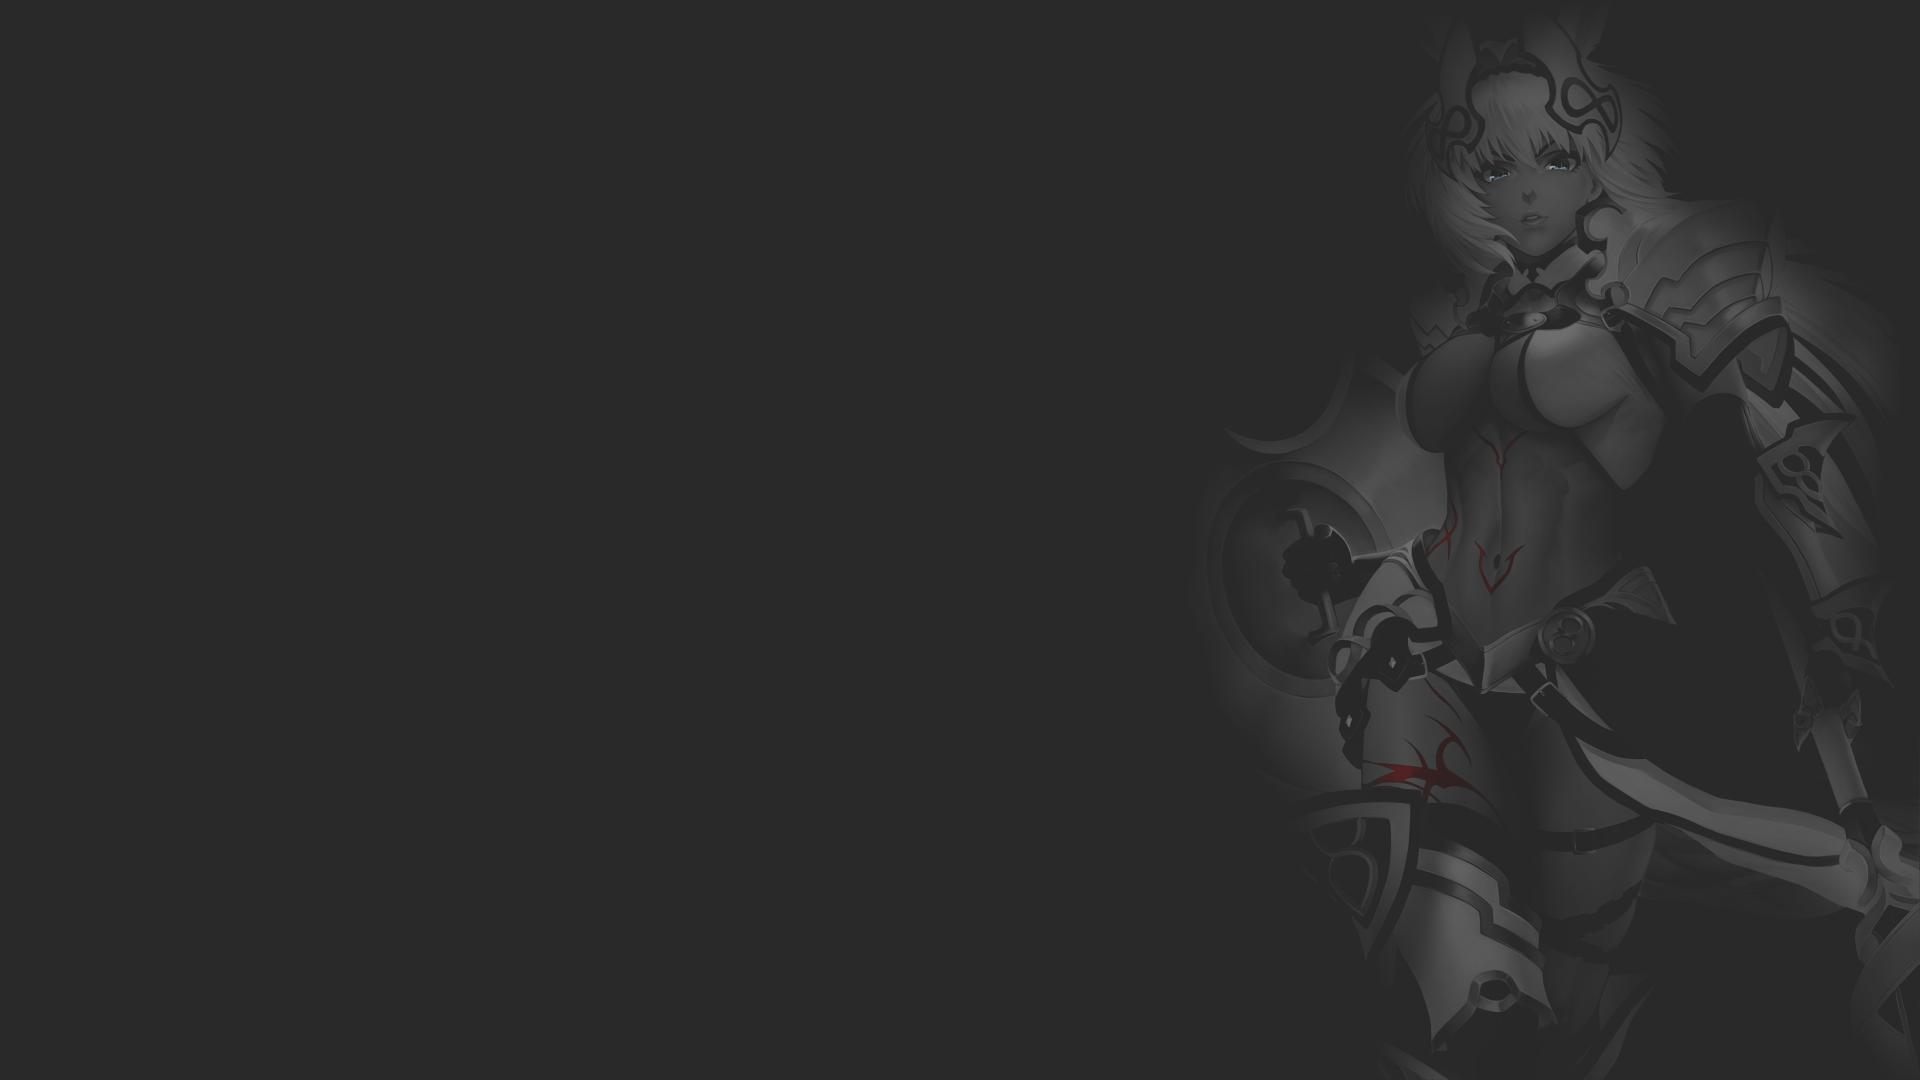 Anime 1920x1080 anime anime girls illustration fan art minimalism monochrome dark background selective coloring texture Fate Series Fate/Grand Order Caenis yamaneko (tkdrumsco) ecchi uniform armor knight warrior boobs animal ears